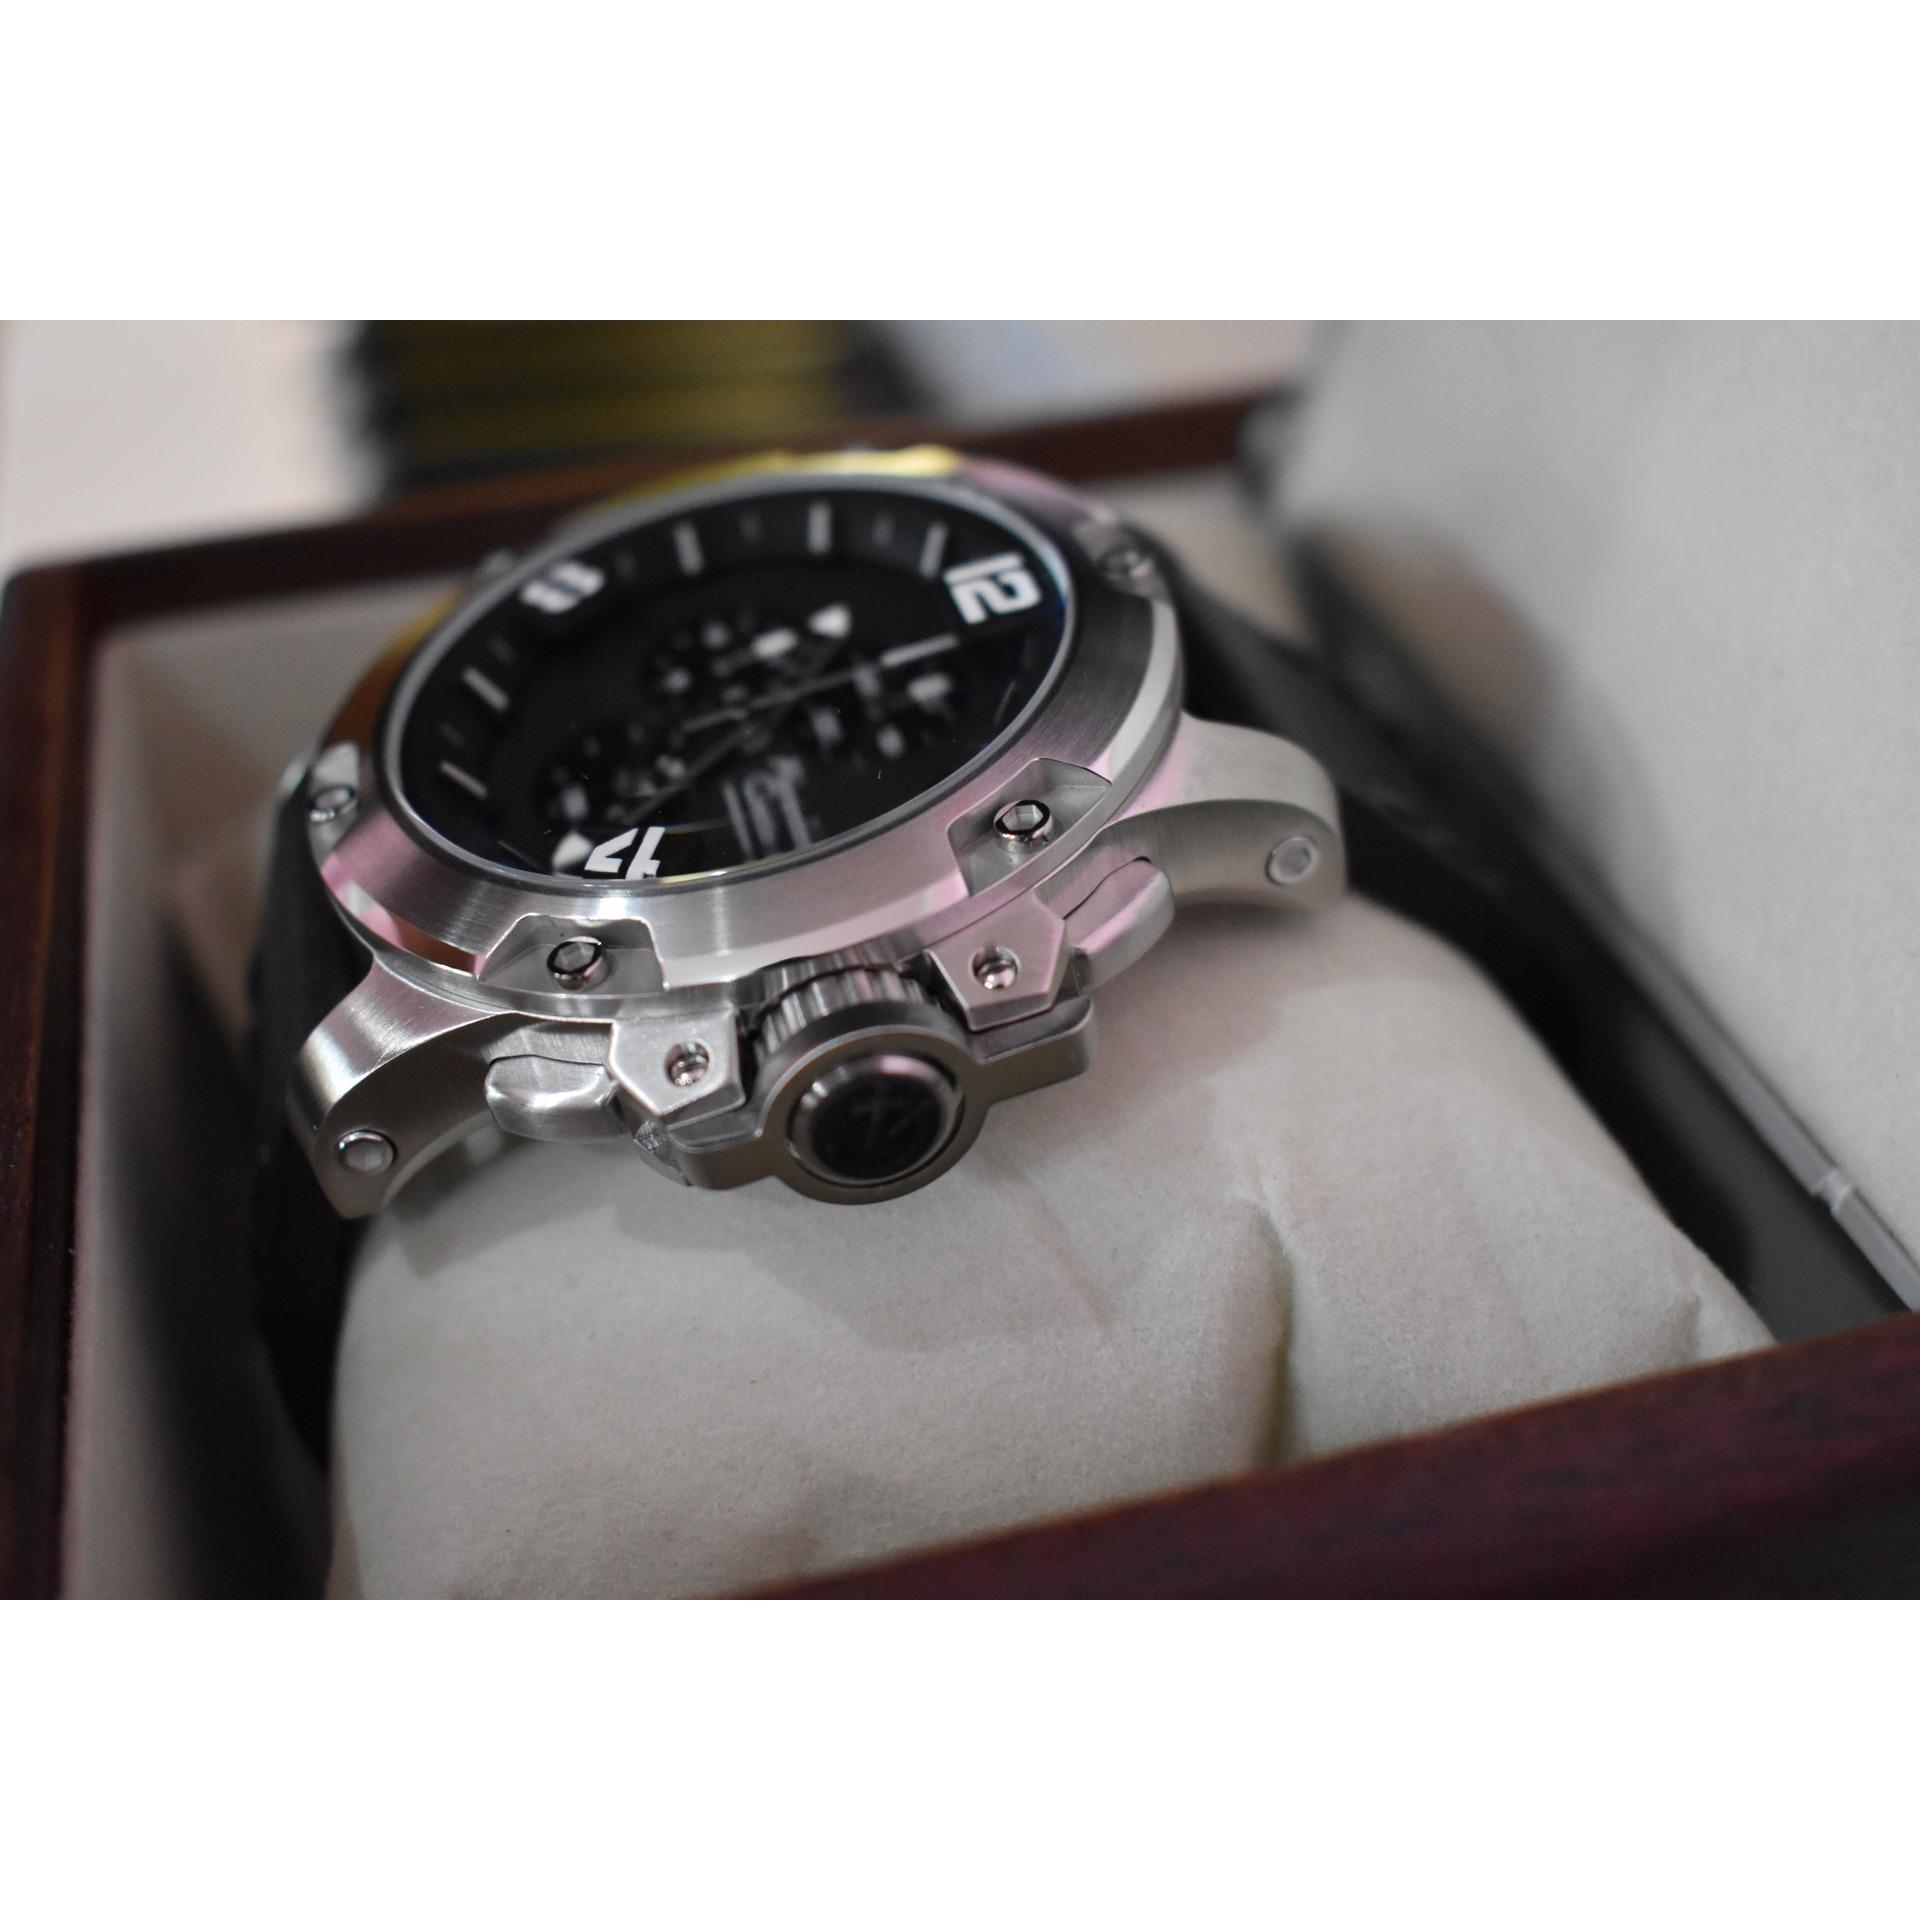 Fitur Jam Tangan Alexandre Christie Ac 6295 Mc Ac6295 Silver Black 6141 Full Original Leather 3